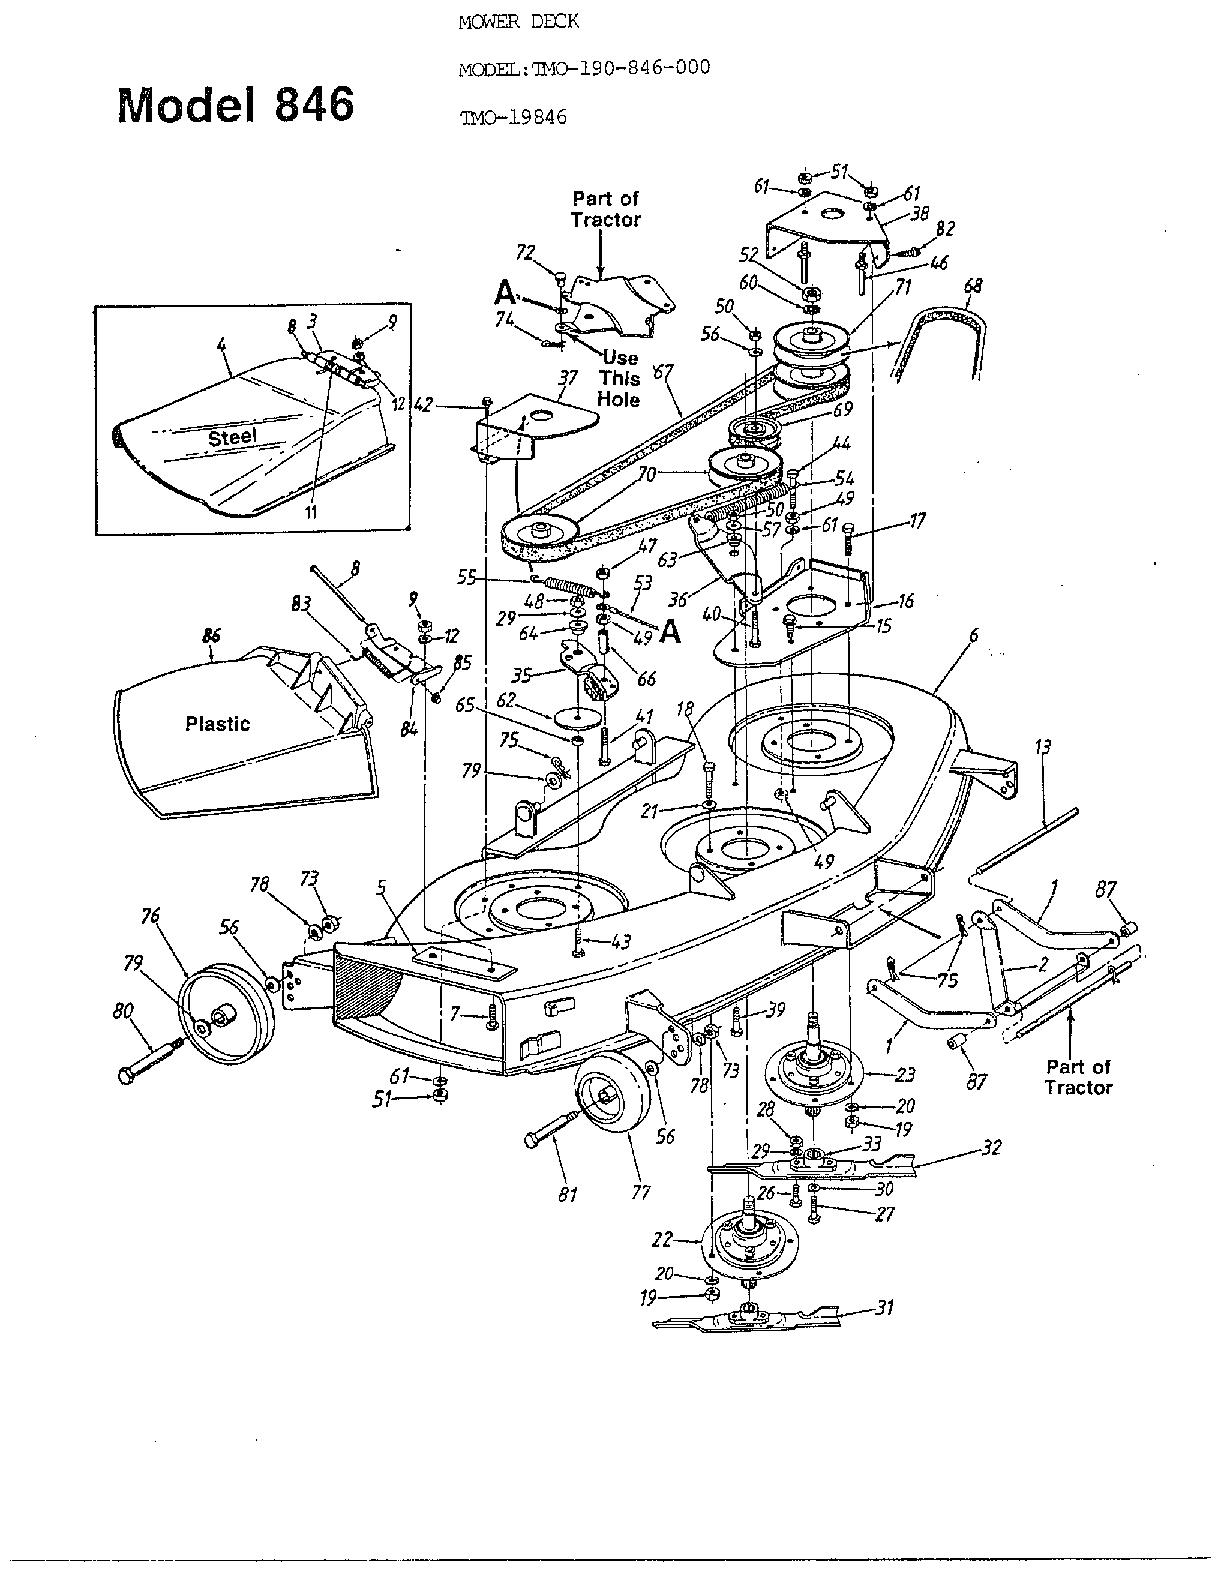 Mtd Yardman Parts Diagram : 25 Wiring Diagram Images